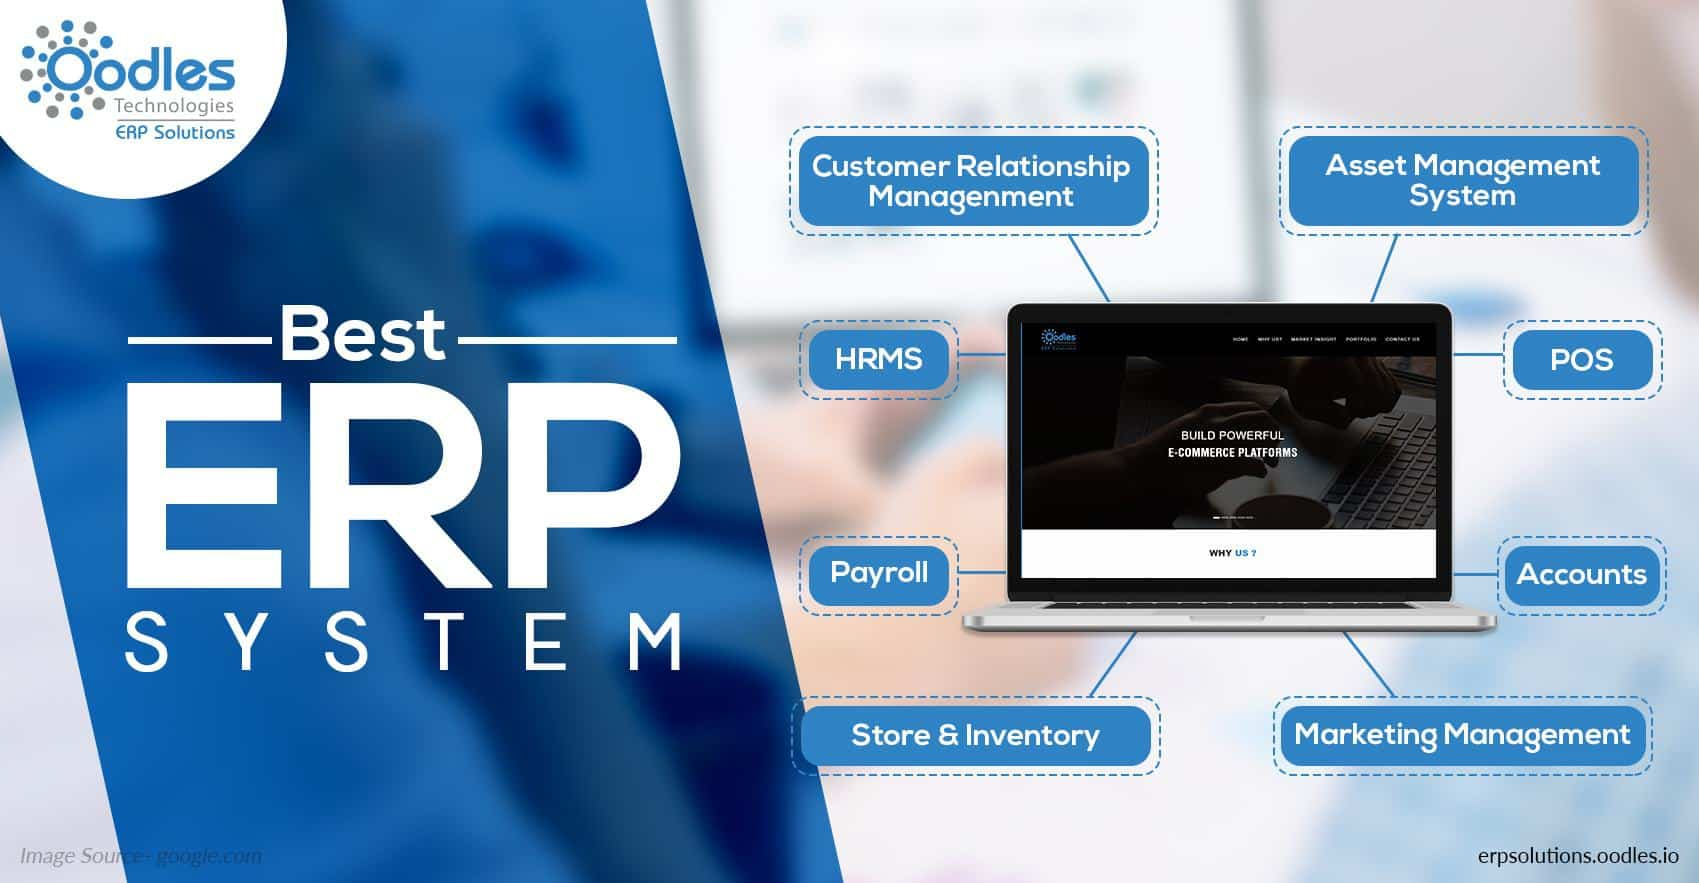 Best ERP System